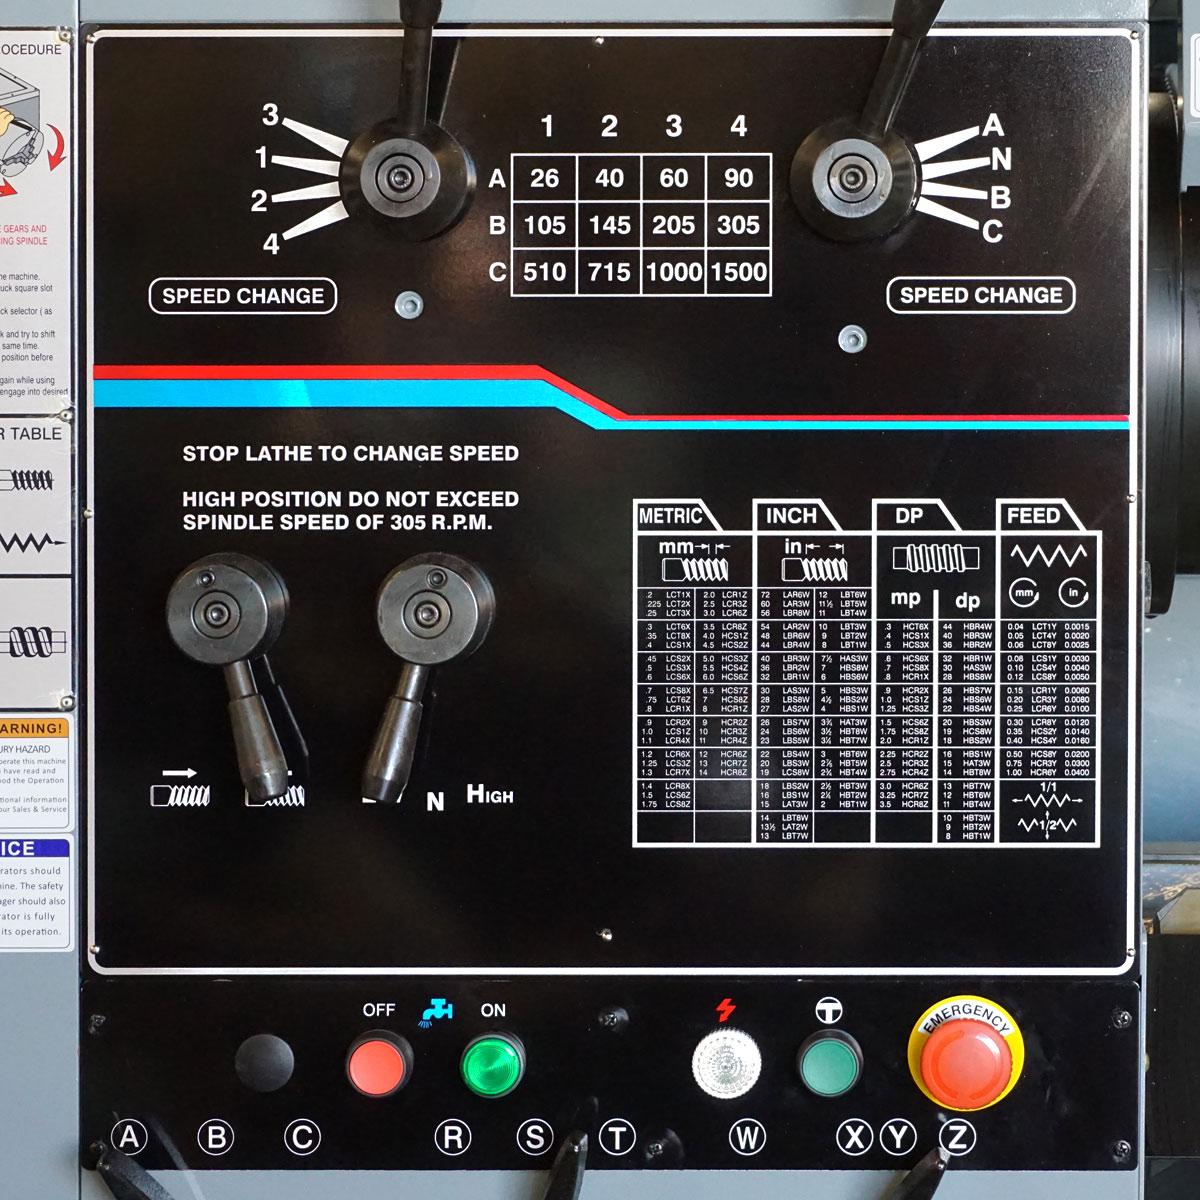 25-1500 RPM Spindle Range